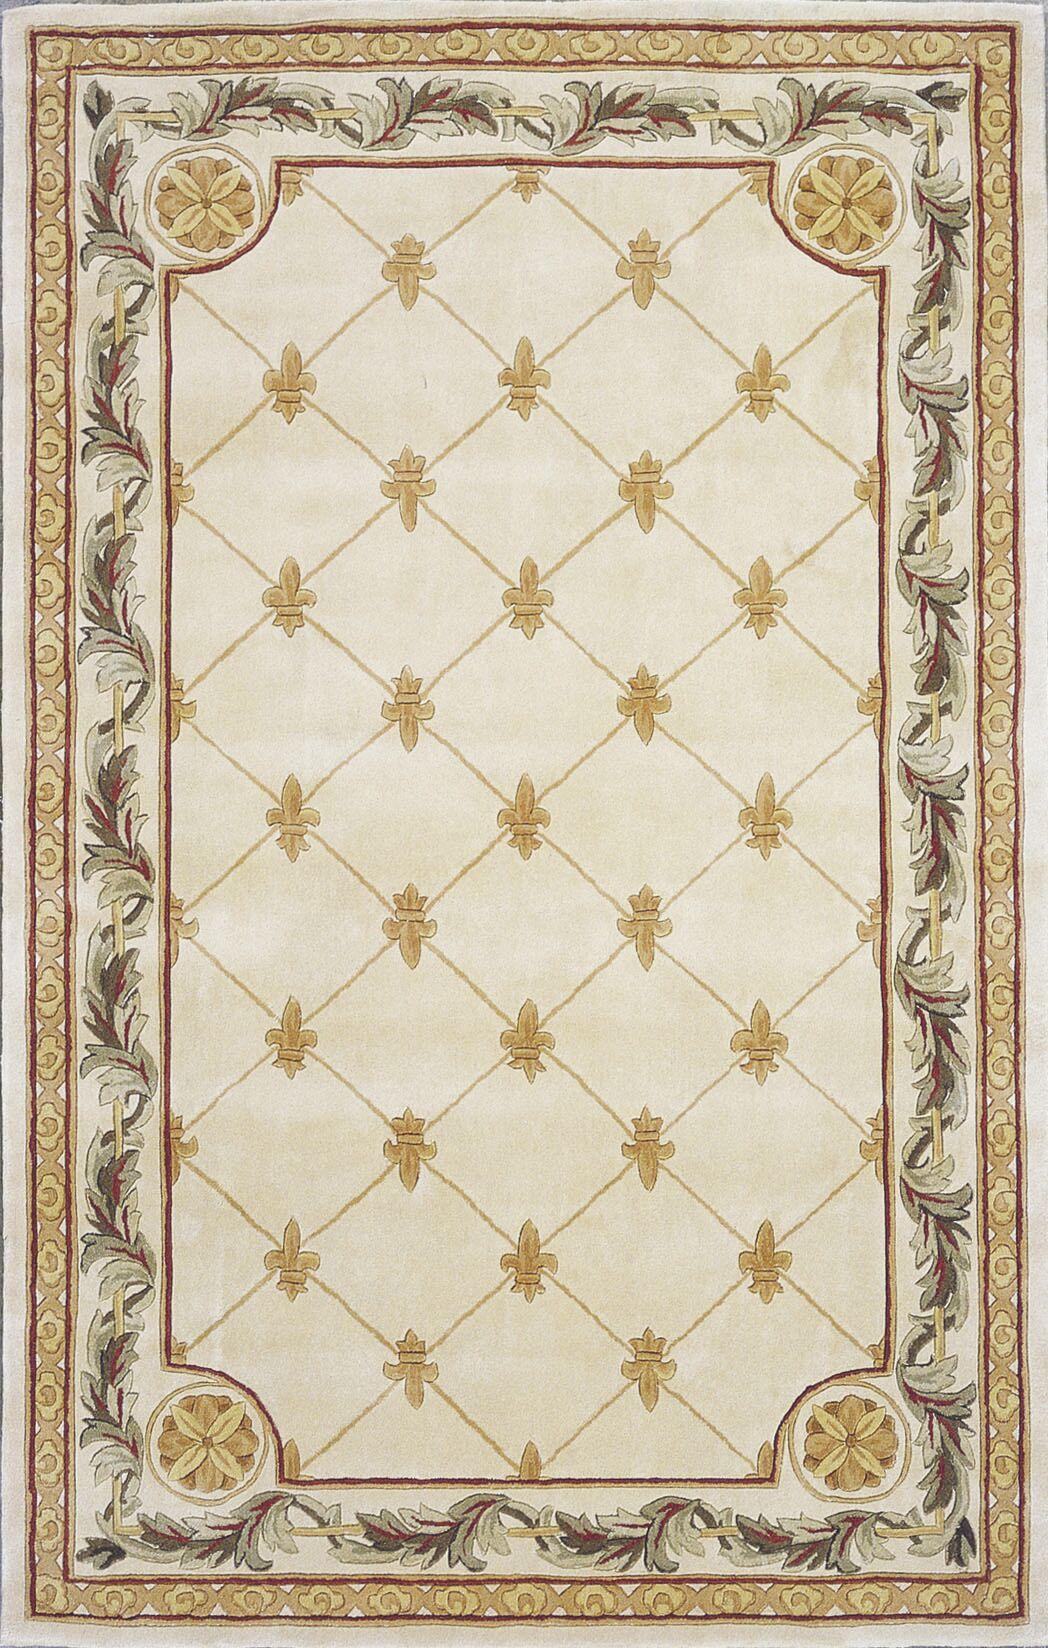 Totternhoe Antique Ivory Fleur-De-Lis Rug Rug Size: Rectangle 9'6